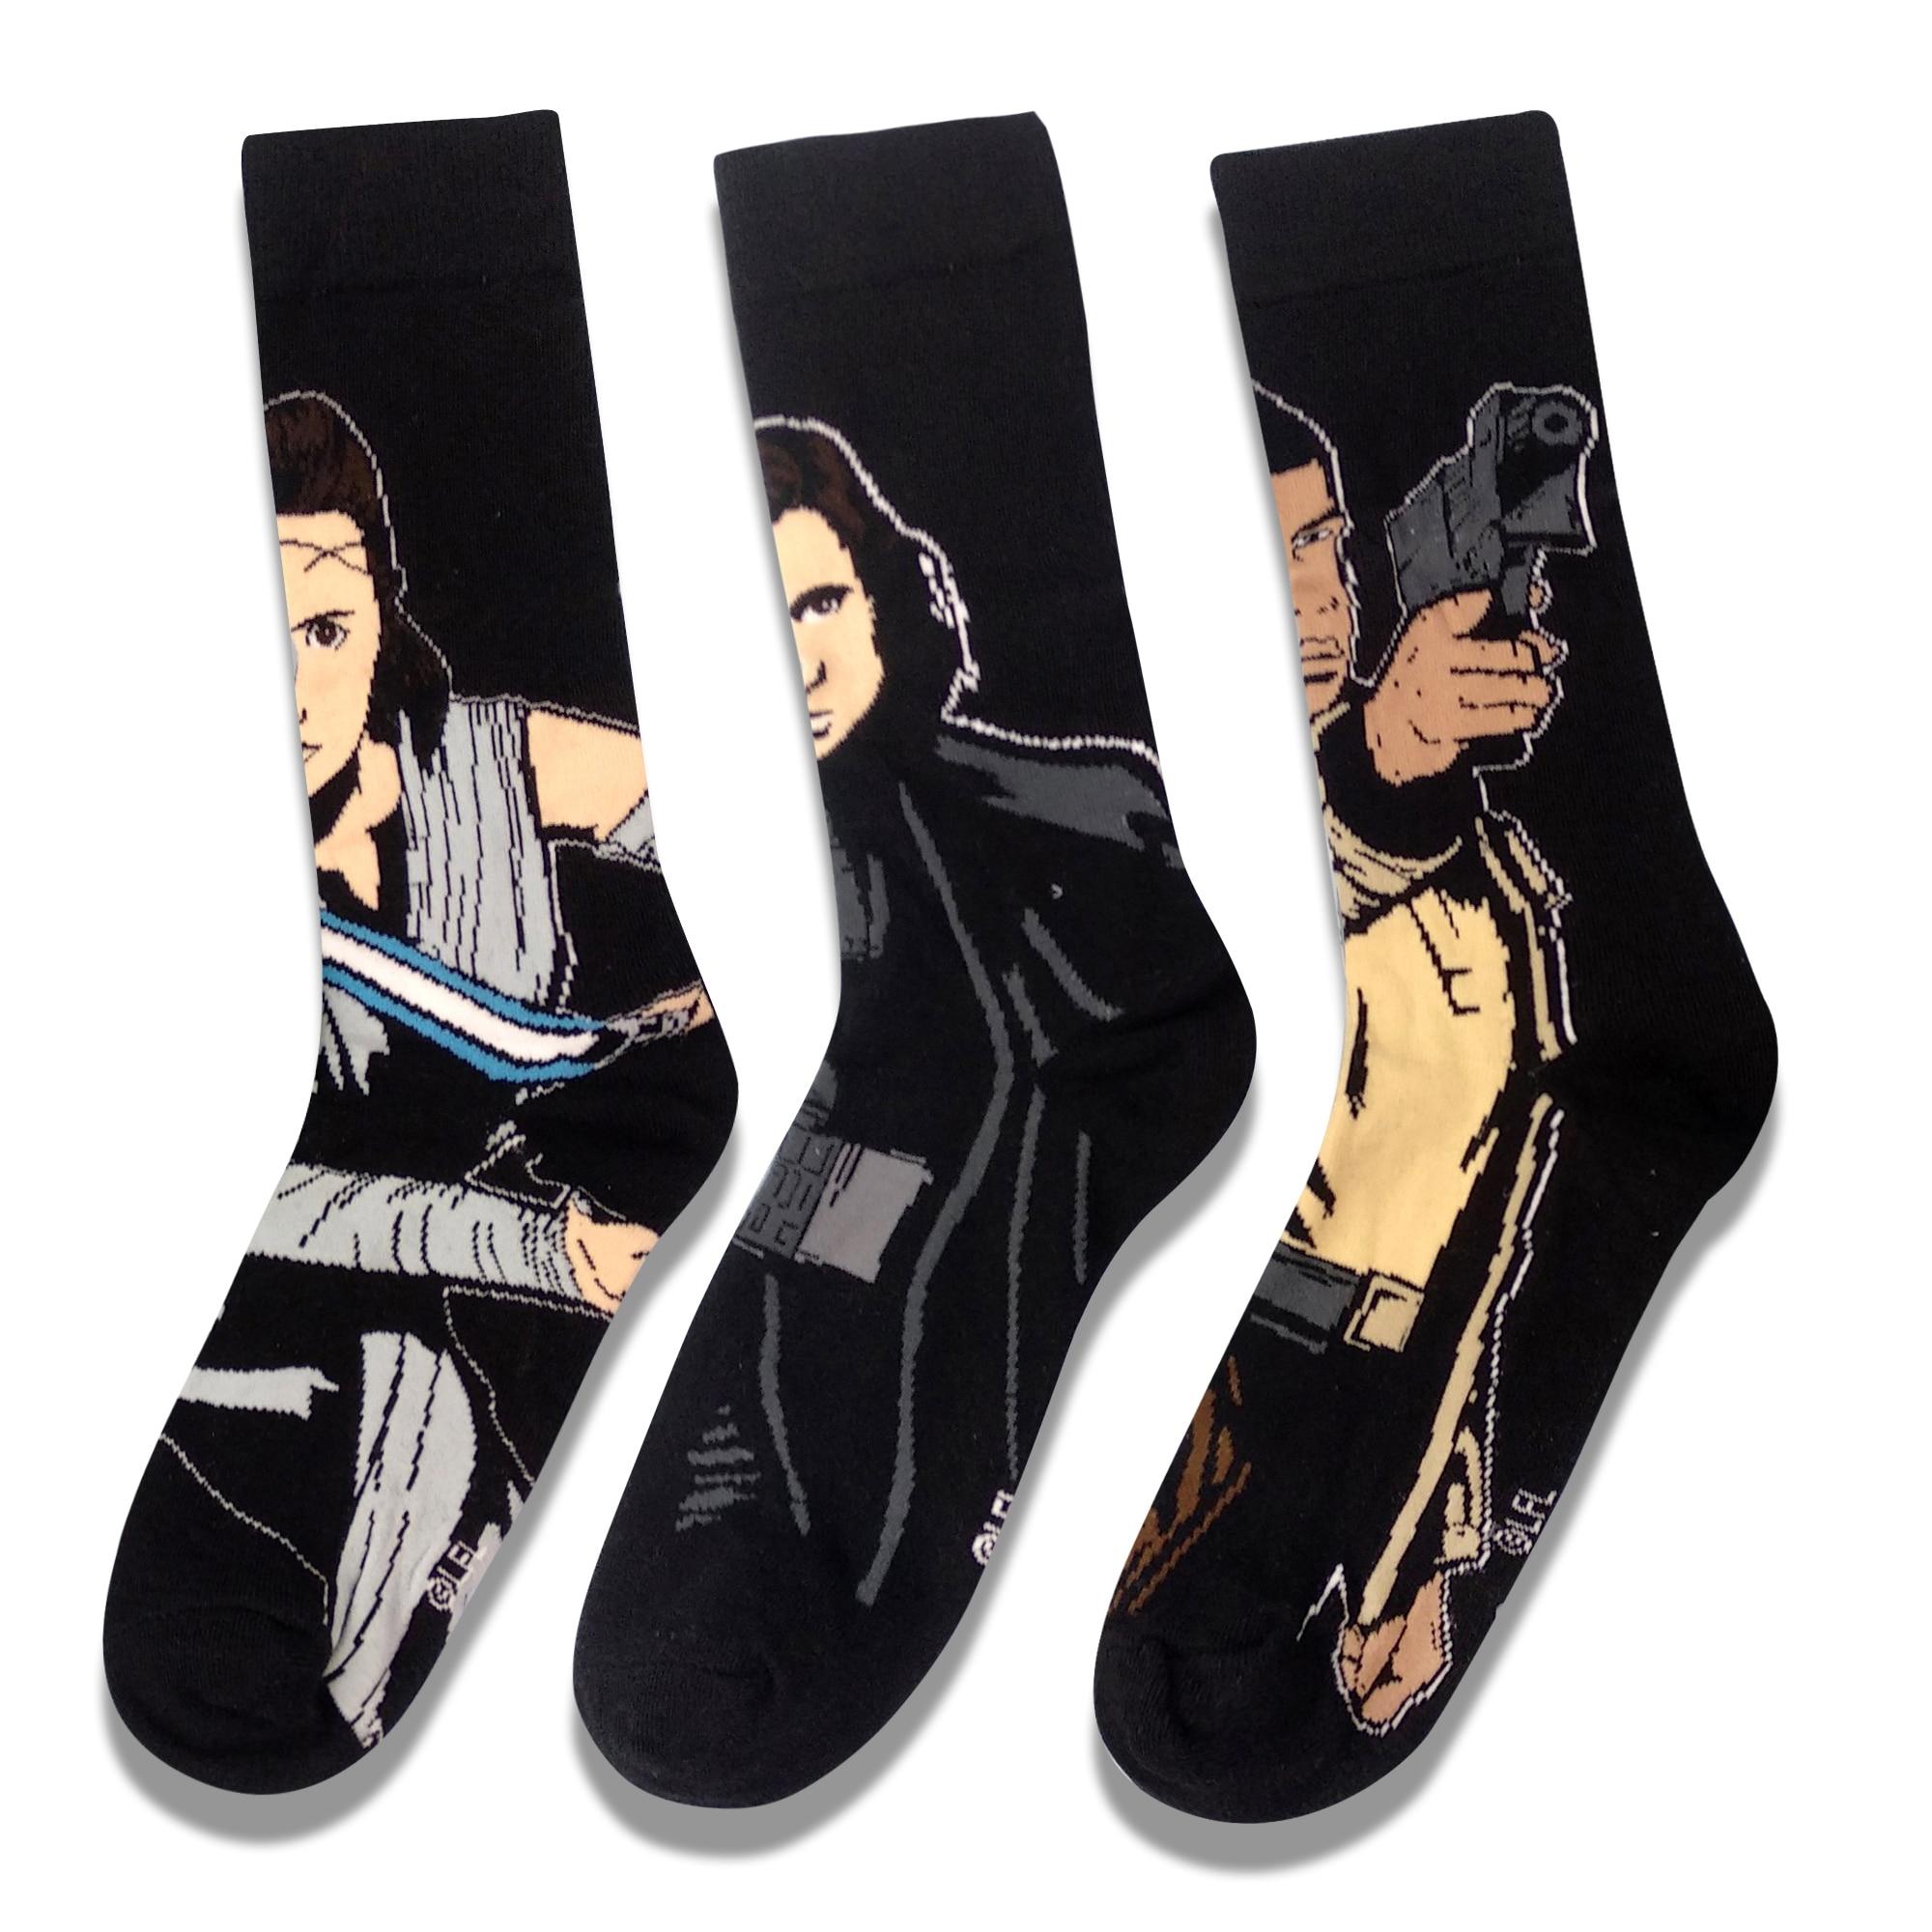 Black Casual Movie Character Star Wars Socks Cosplay Jedi Knight Novelty Men Women Sock Hip Hop Street Skateboard